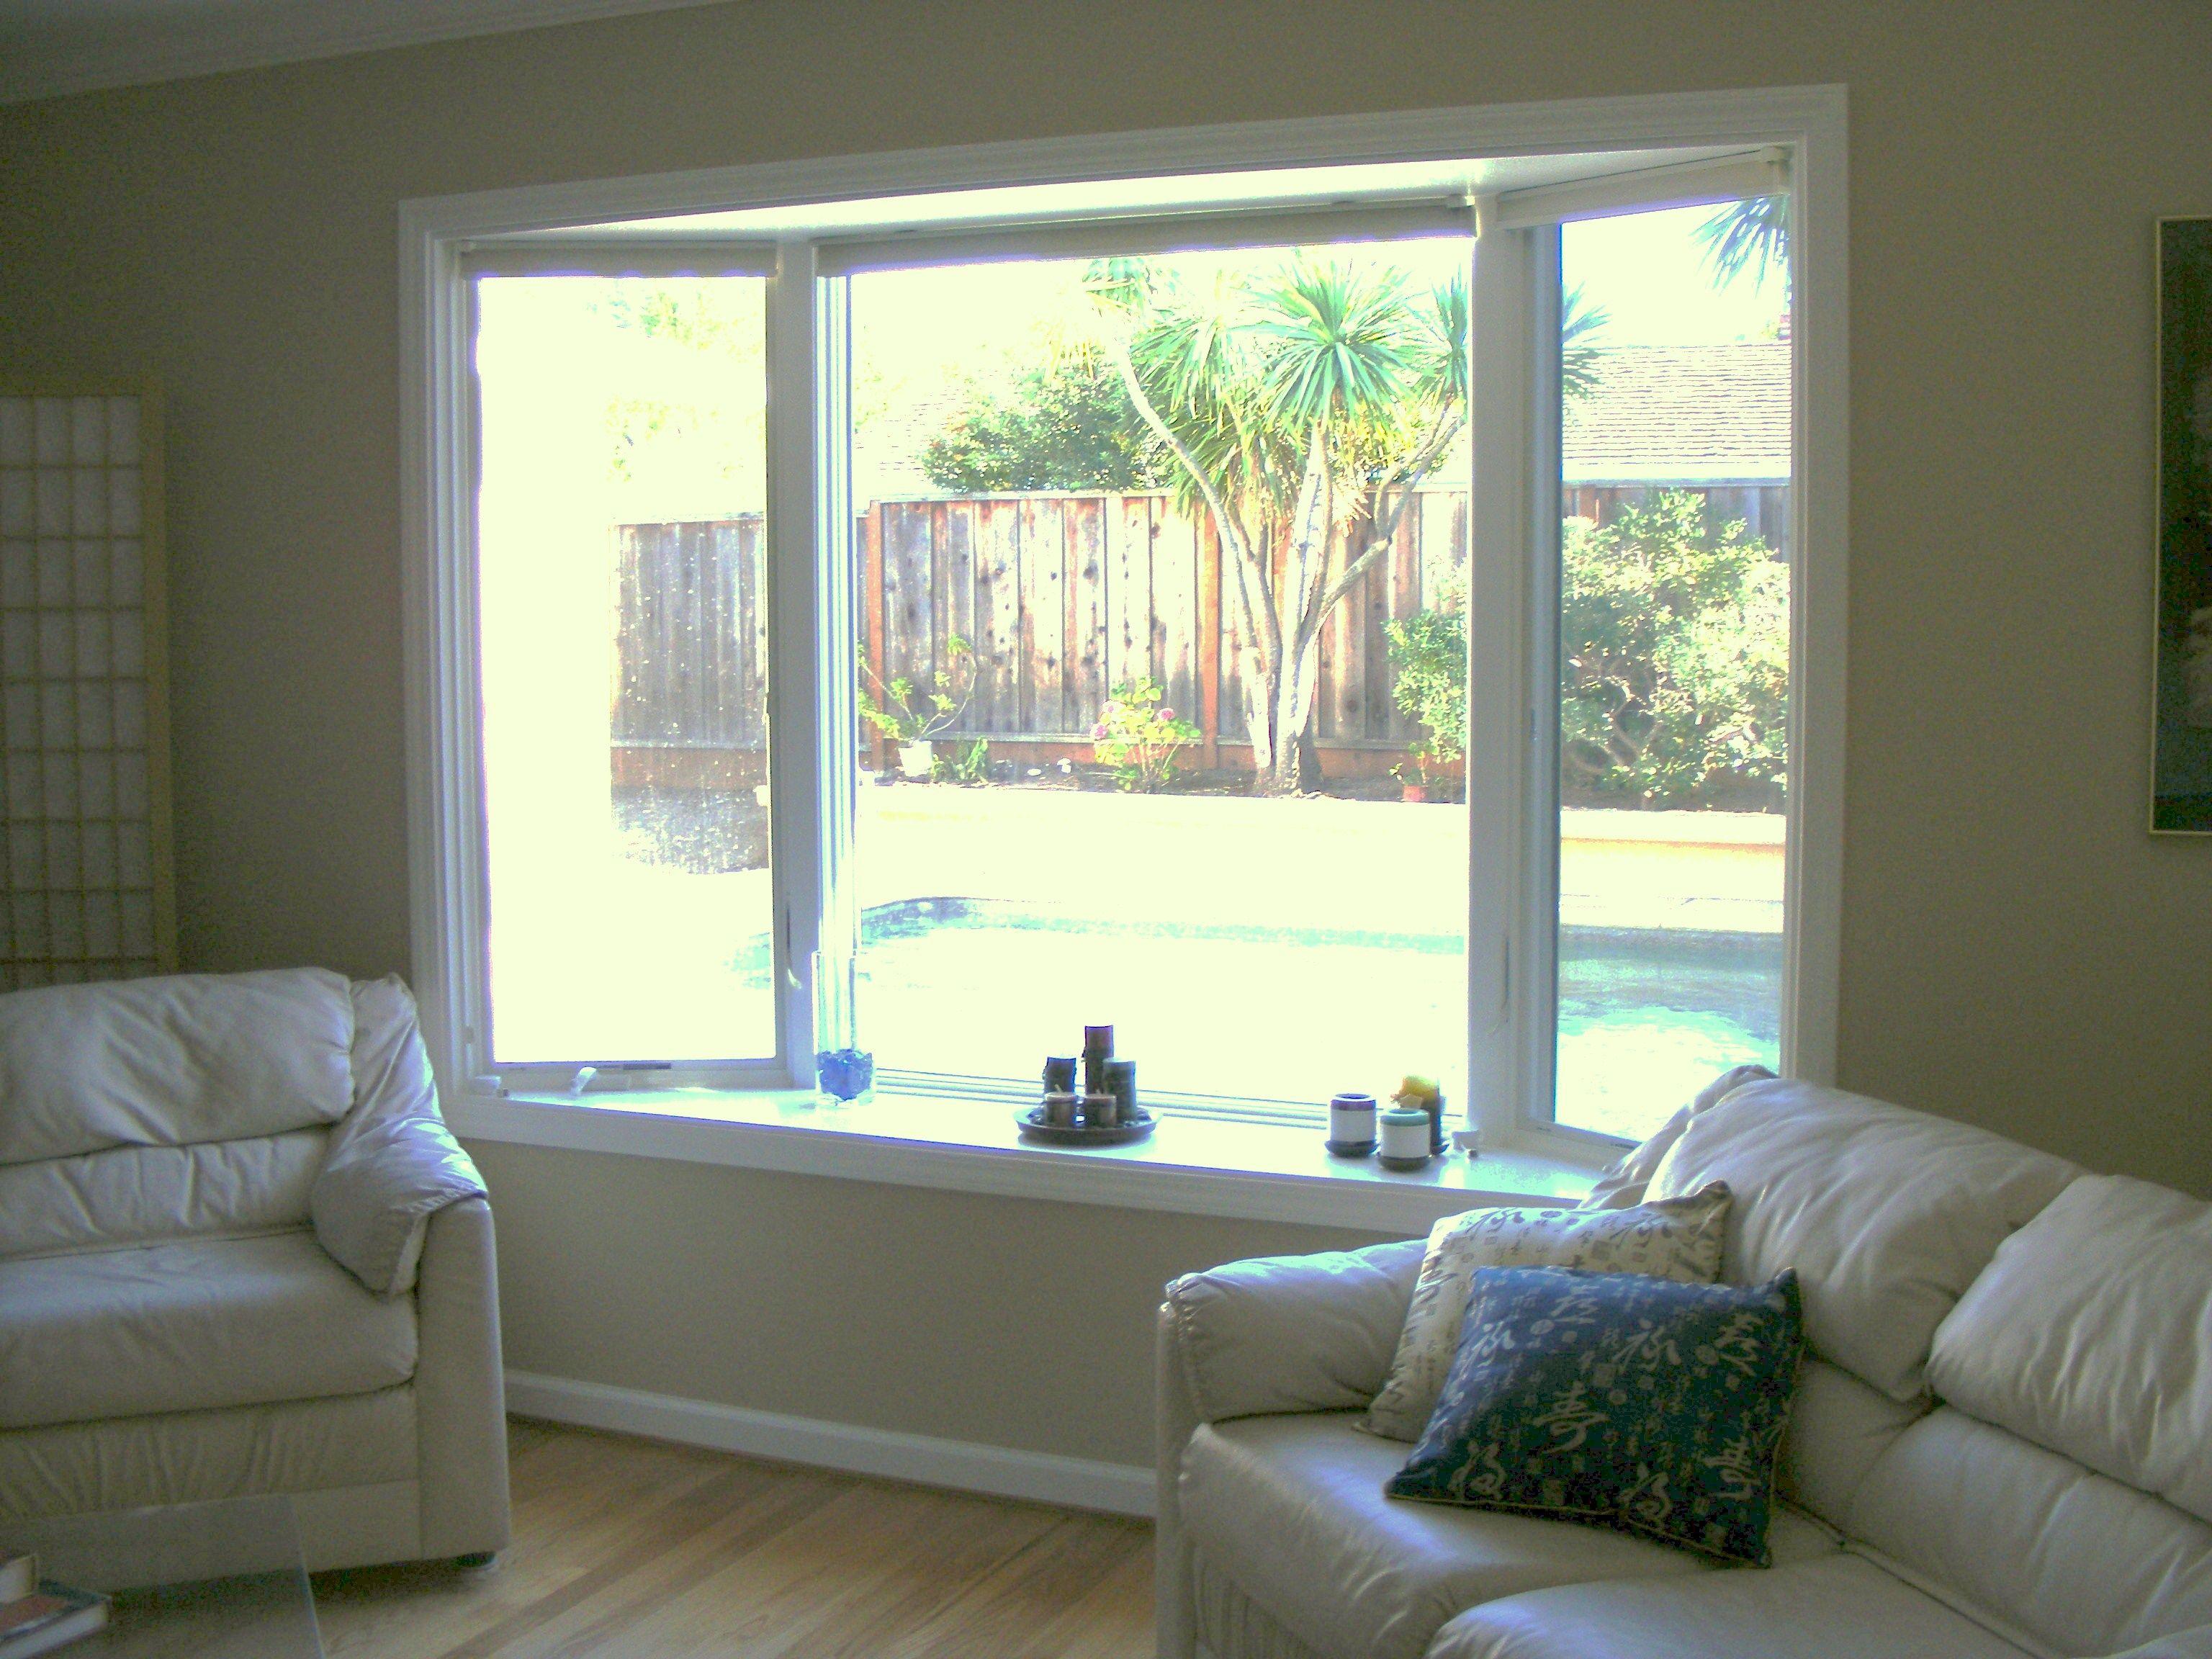 Living room window ideas  bay window design creativity  pinterest  bay window window and room